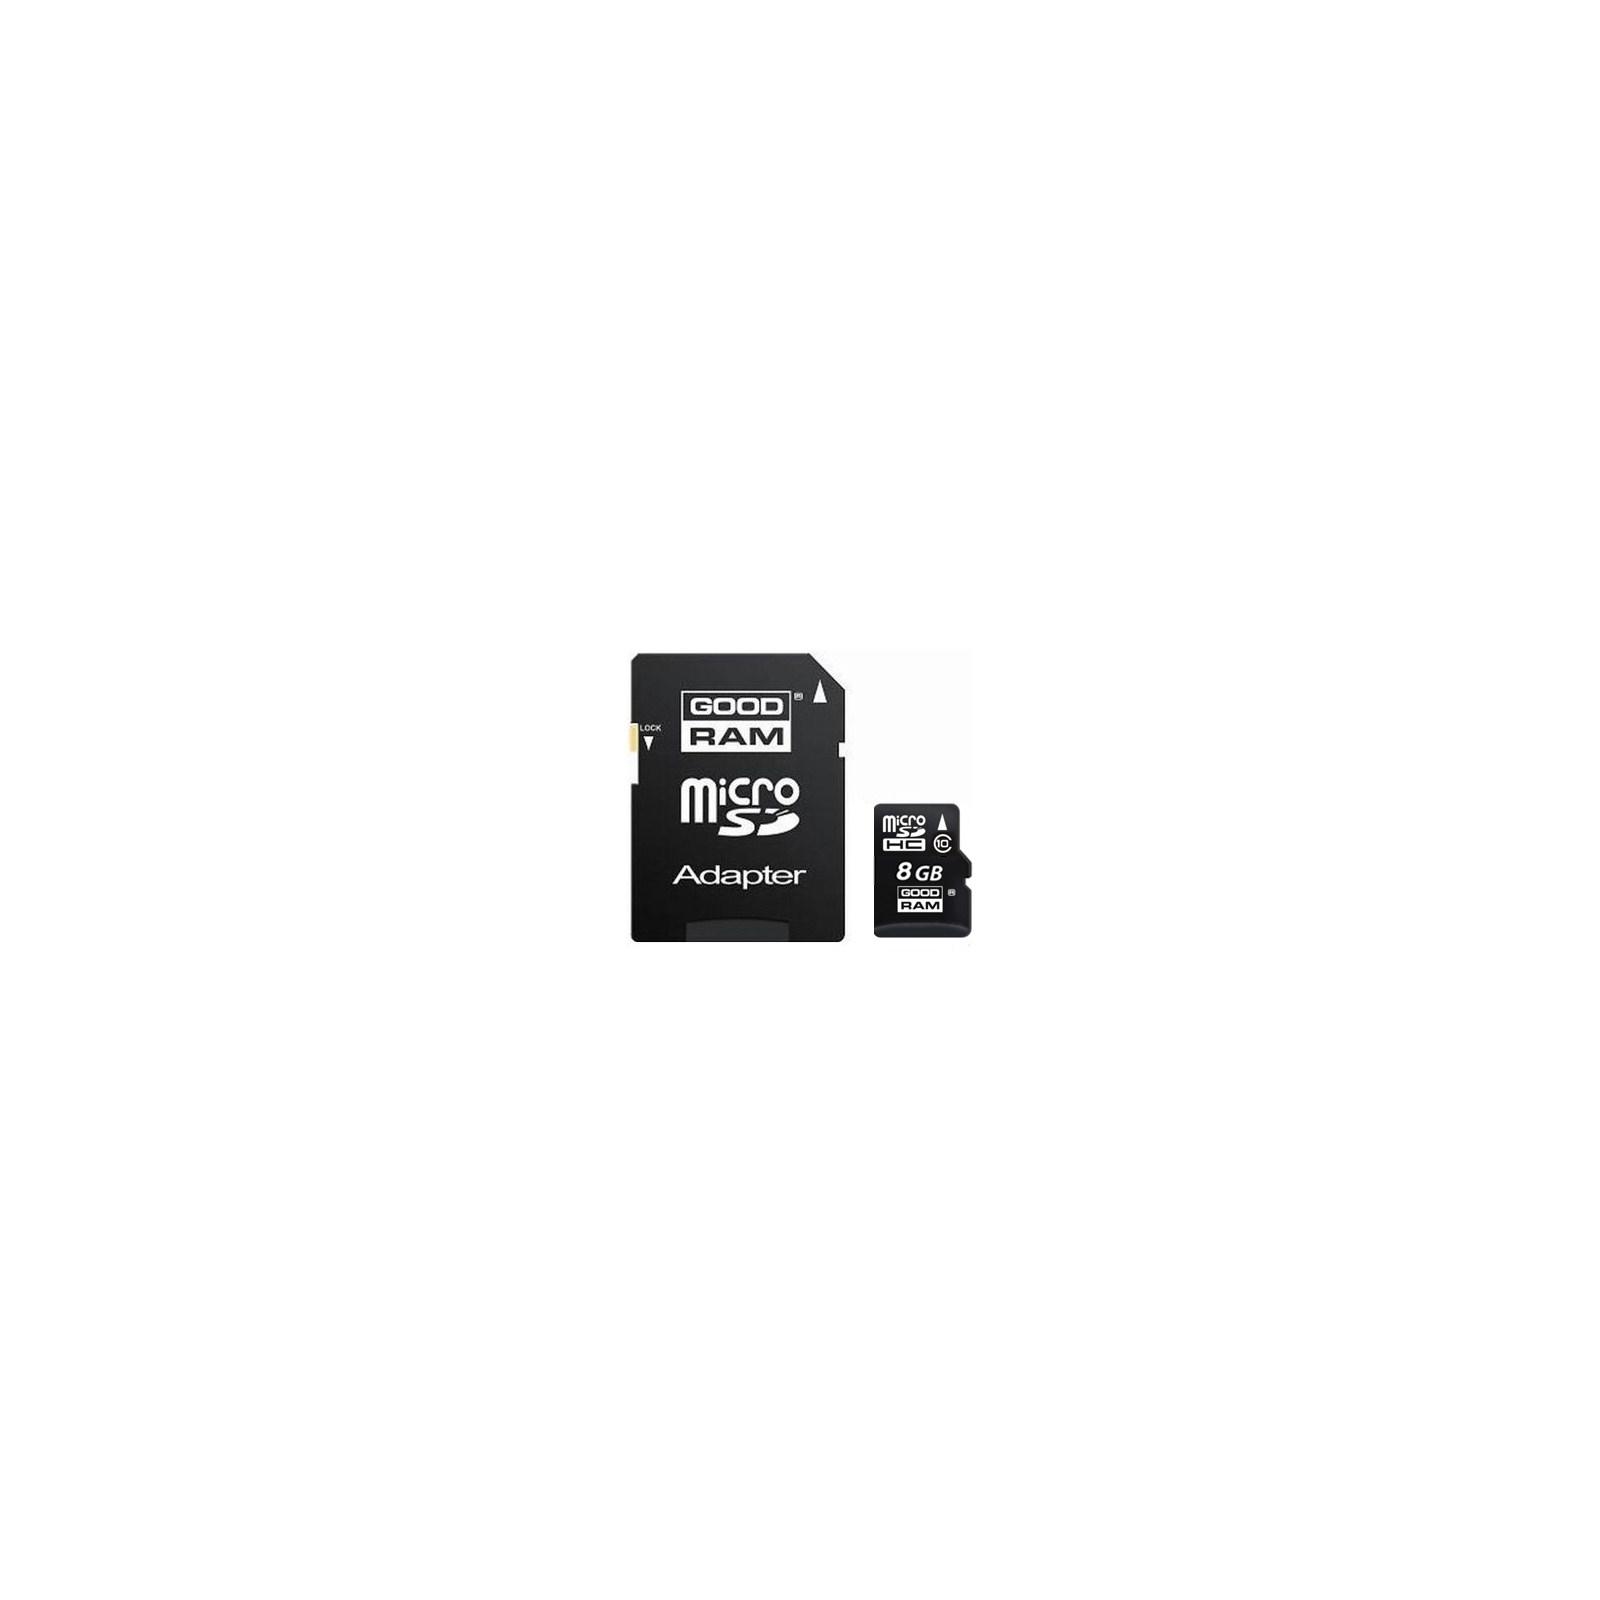 Карта памяти GOODRAM 8Gb microSDHC class 10 (SDU8GHC10AGRR9\SDU8GHC10AGRR10)